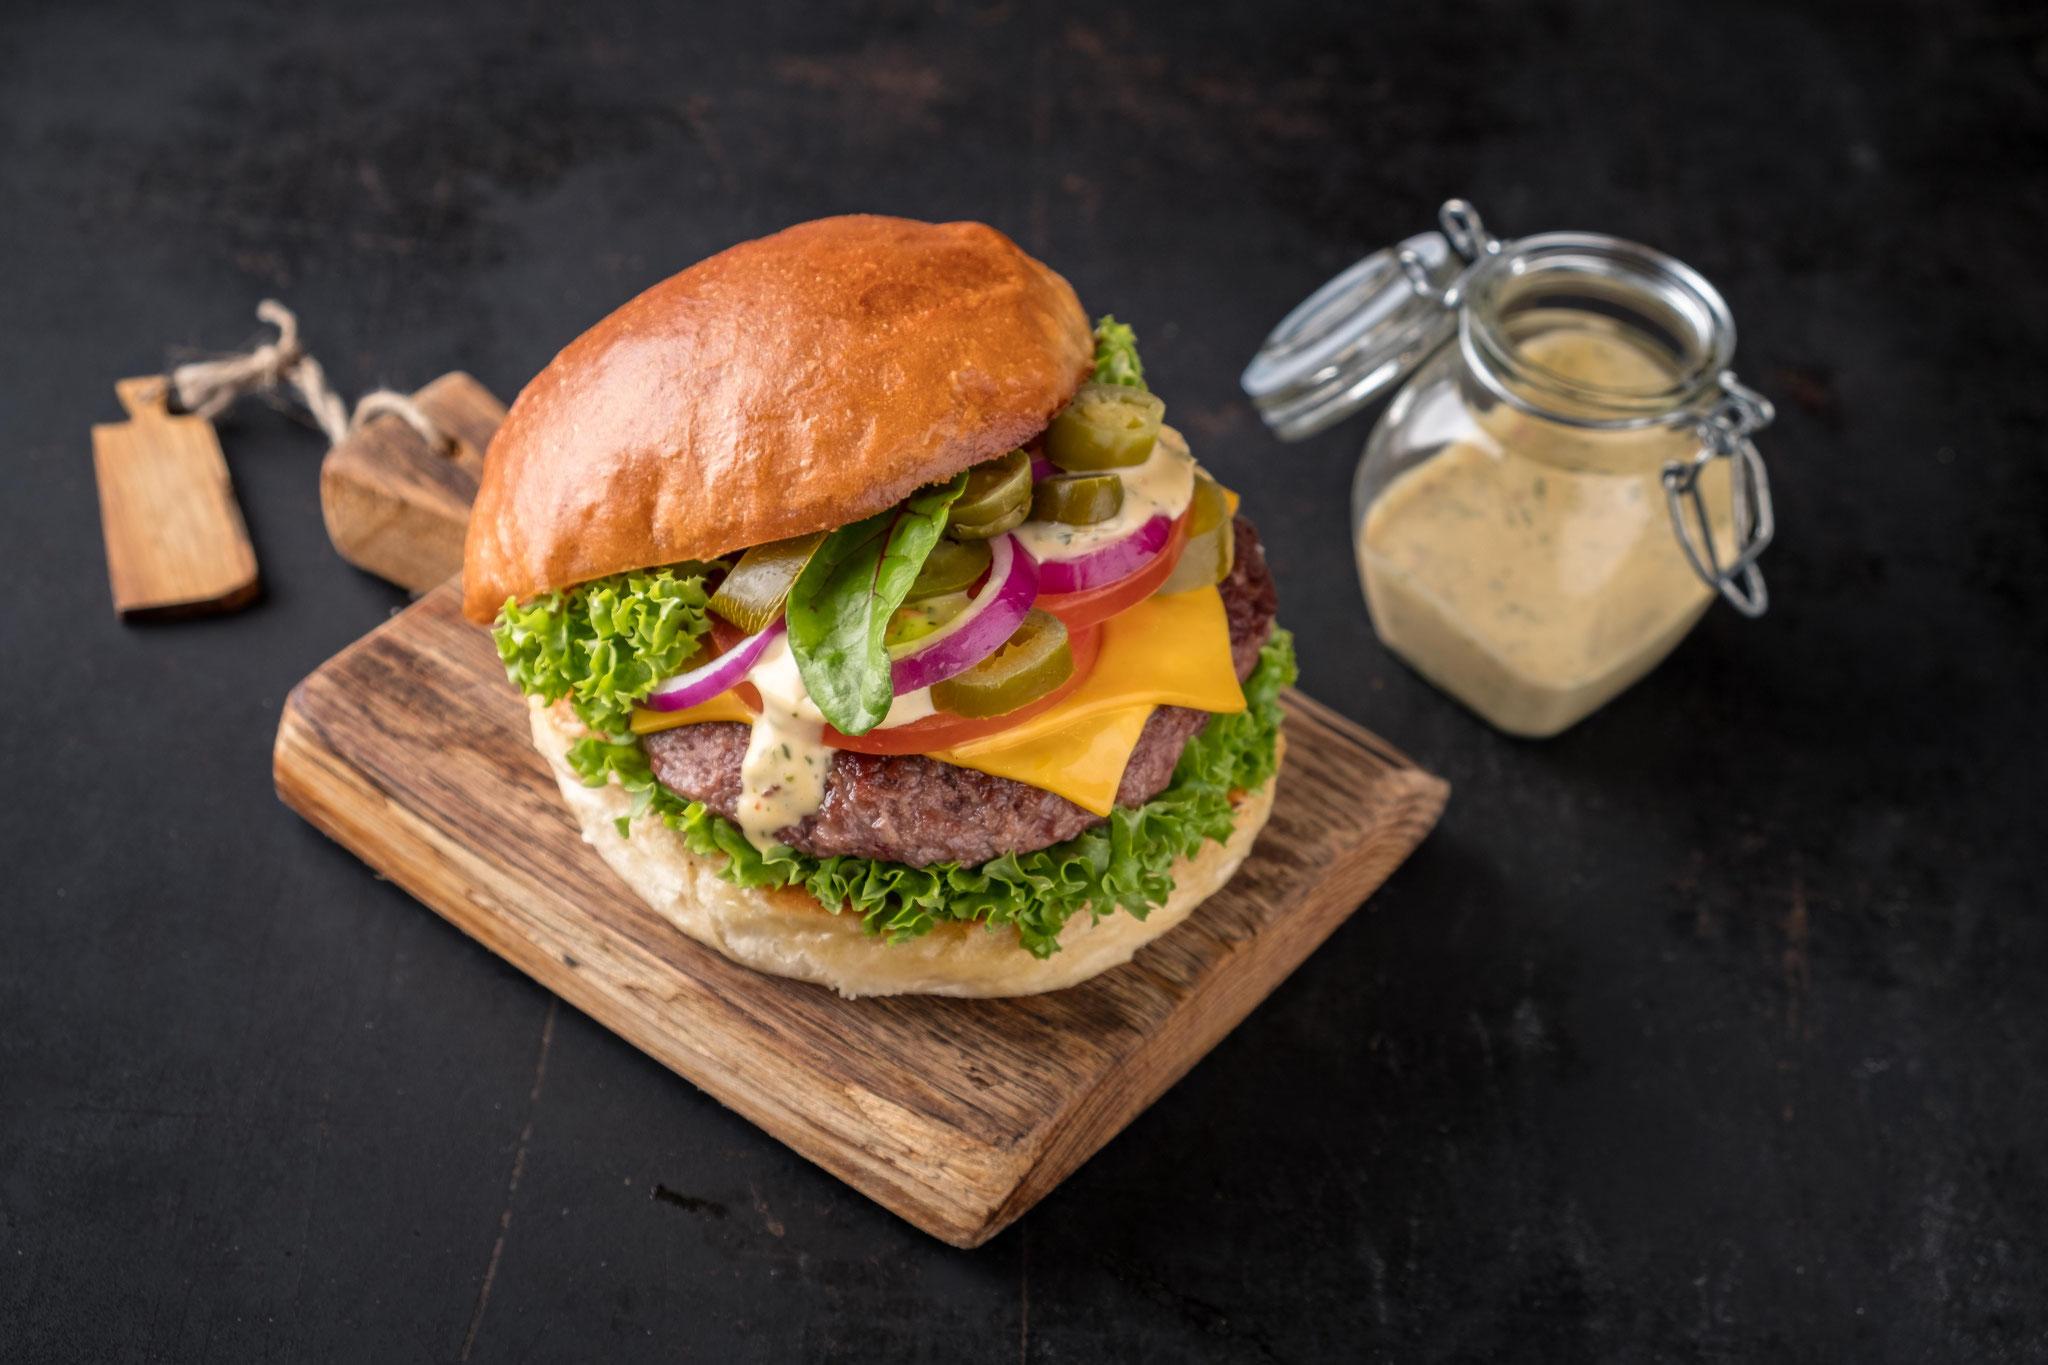 Food-Fotografie Burger 45° Grad Ansicht!